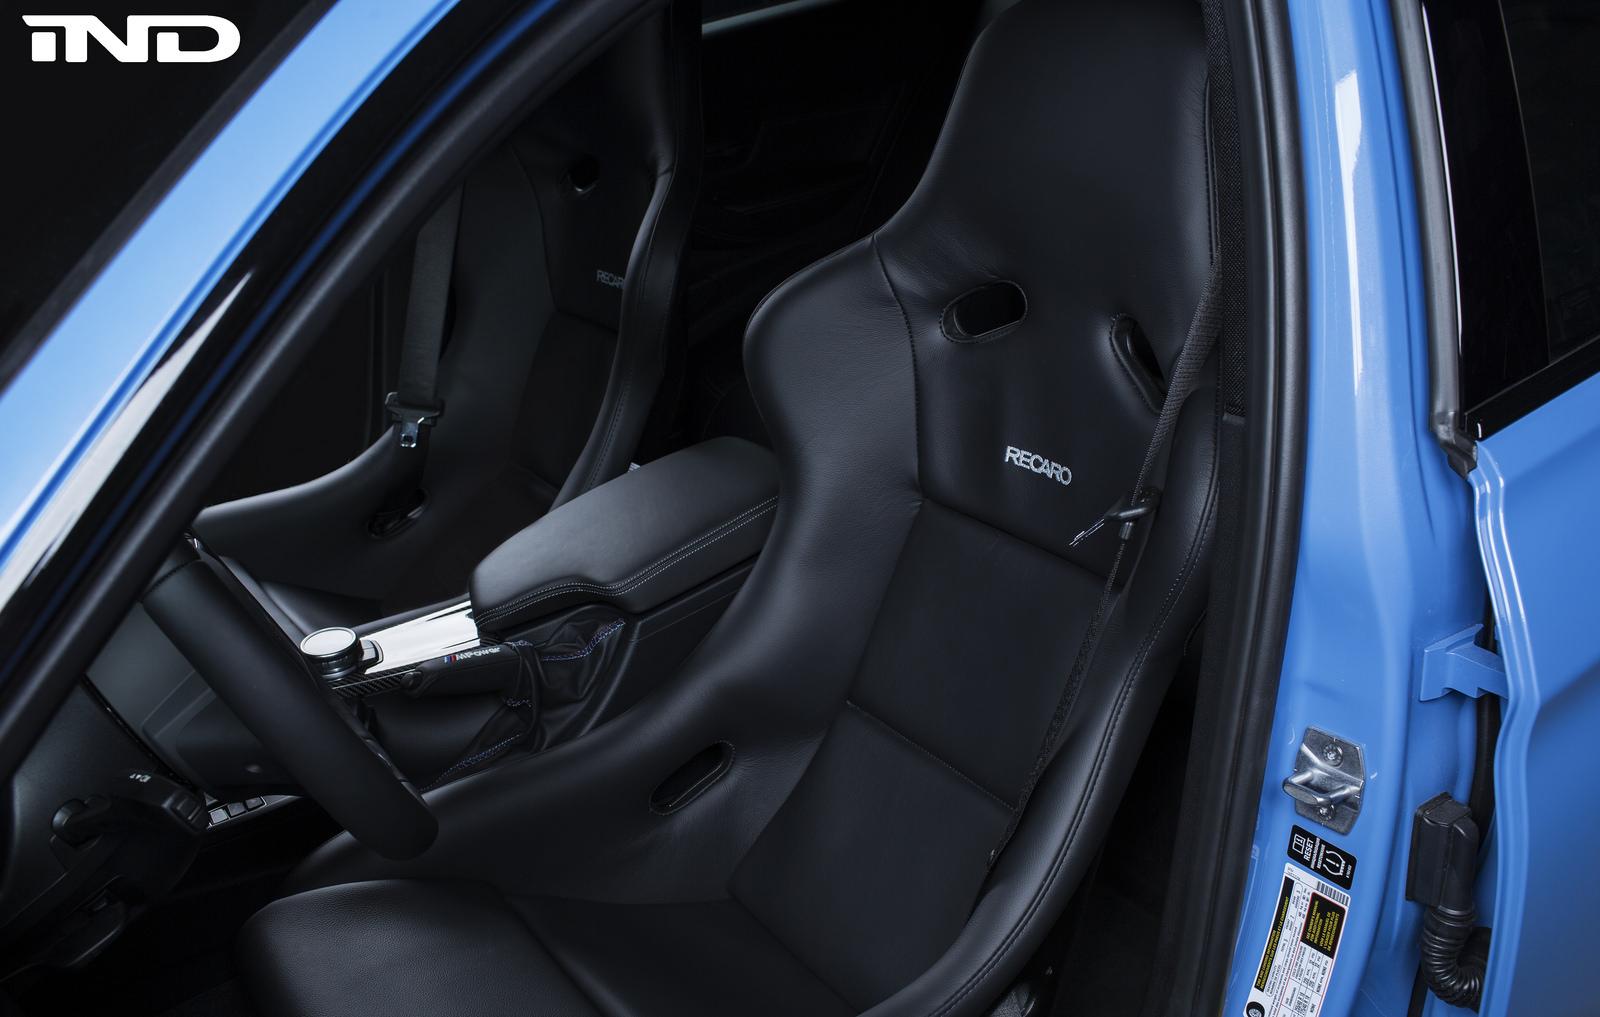 Camaro Car Wallpaper Bmw F80 M3 Gets Recaro Seats Autoevolution